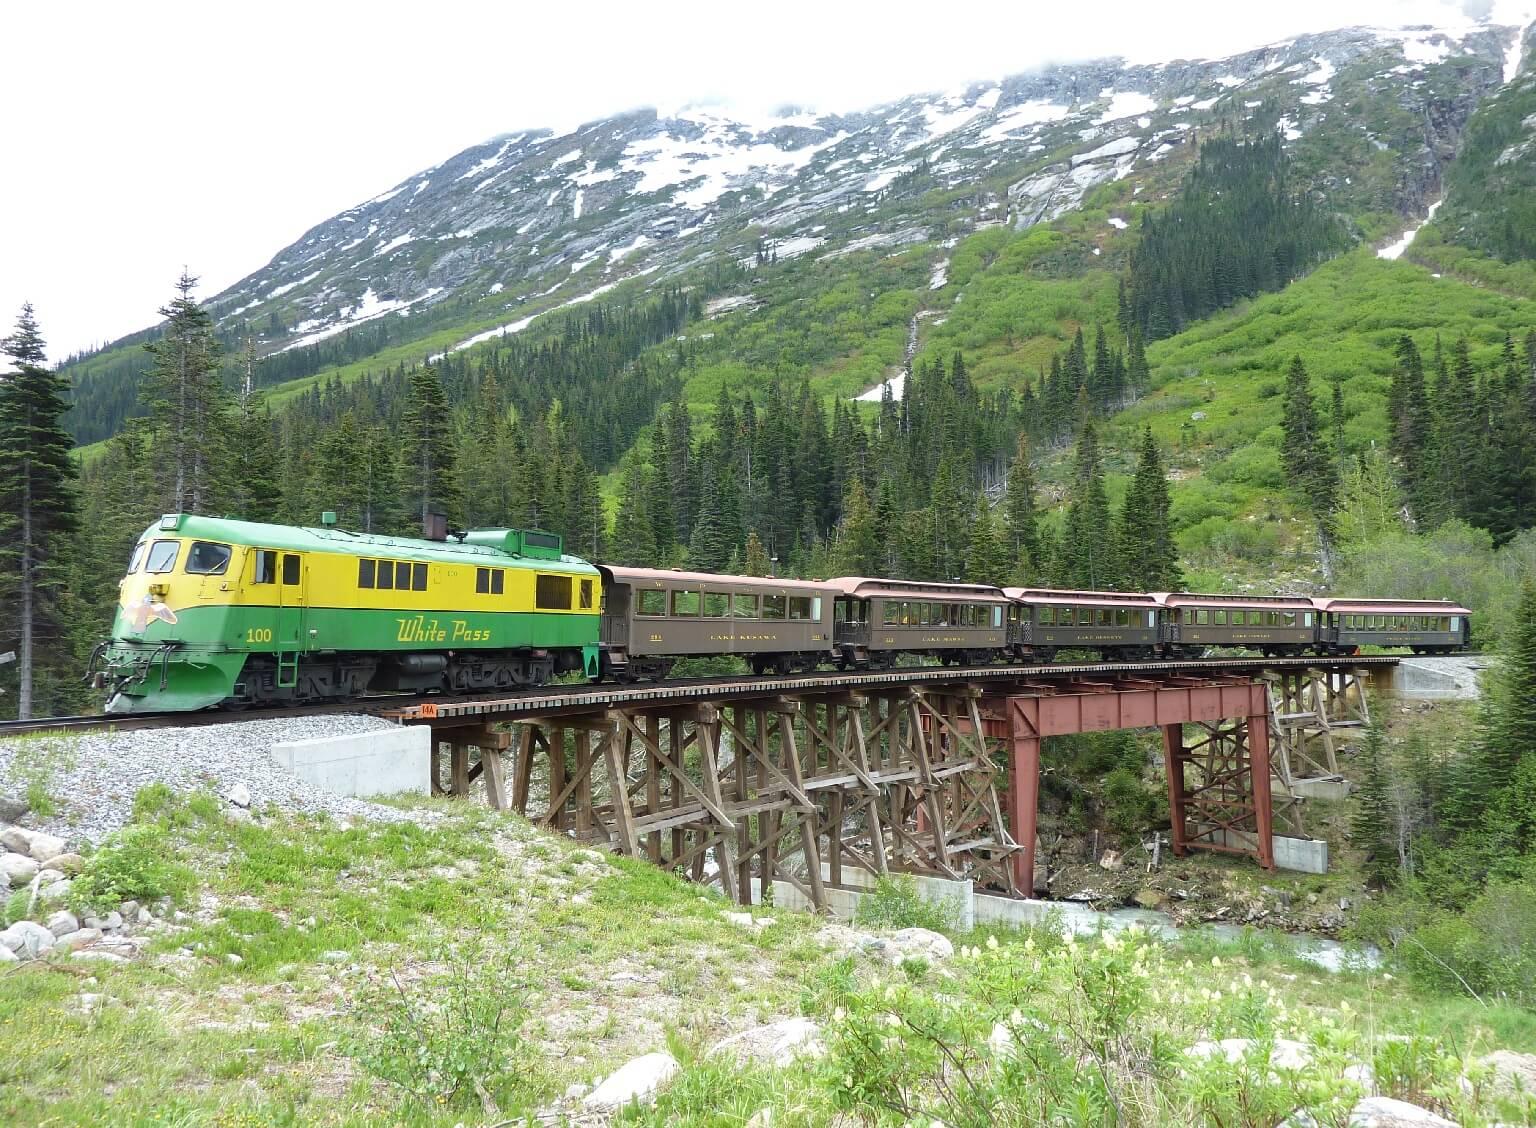 The White Pass Railway today.